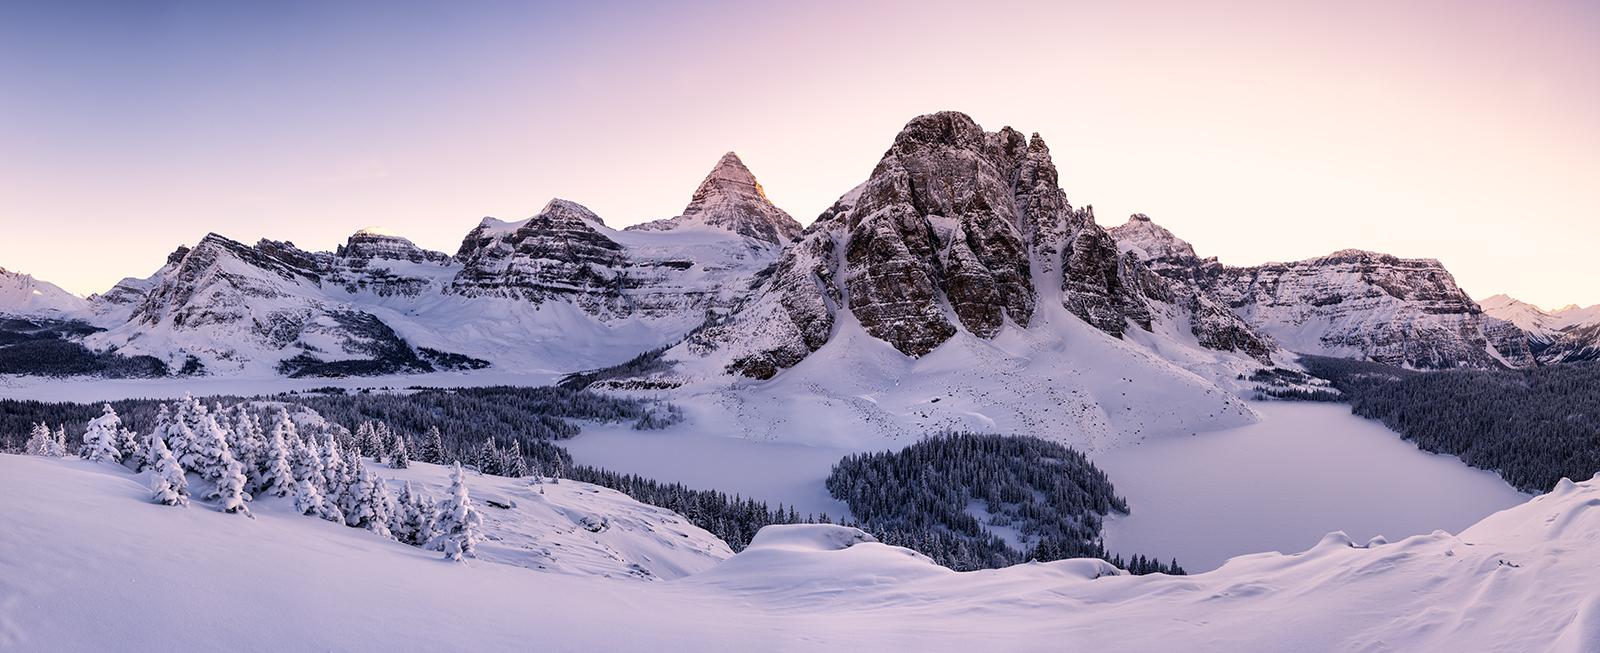 Paisajes y montañas blancas - 1600x653